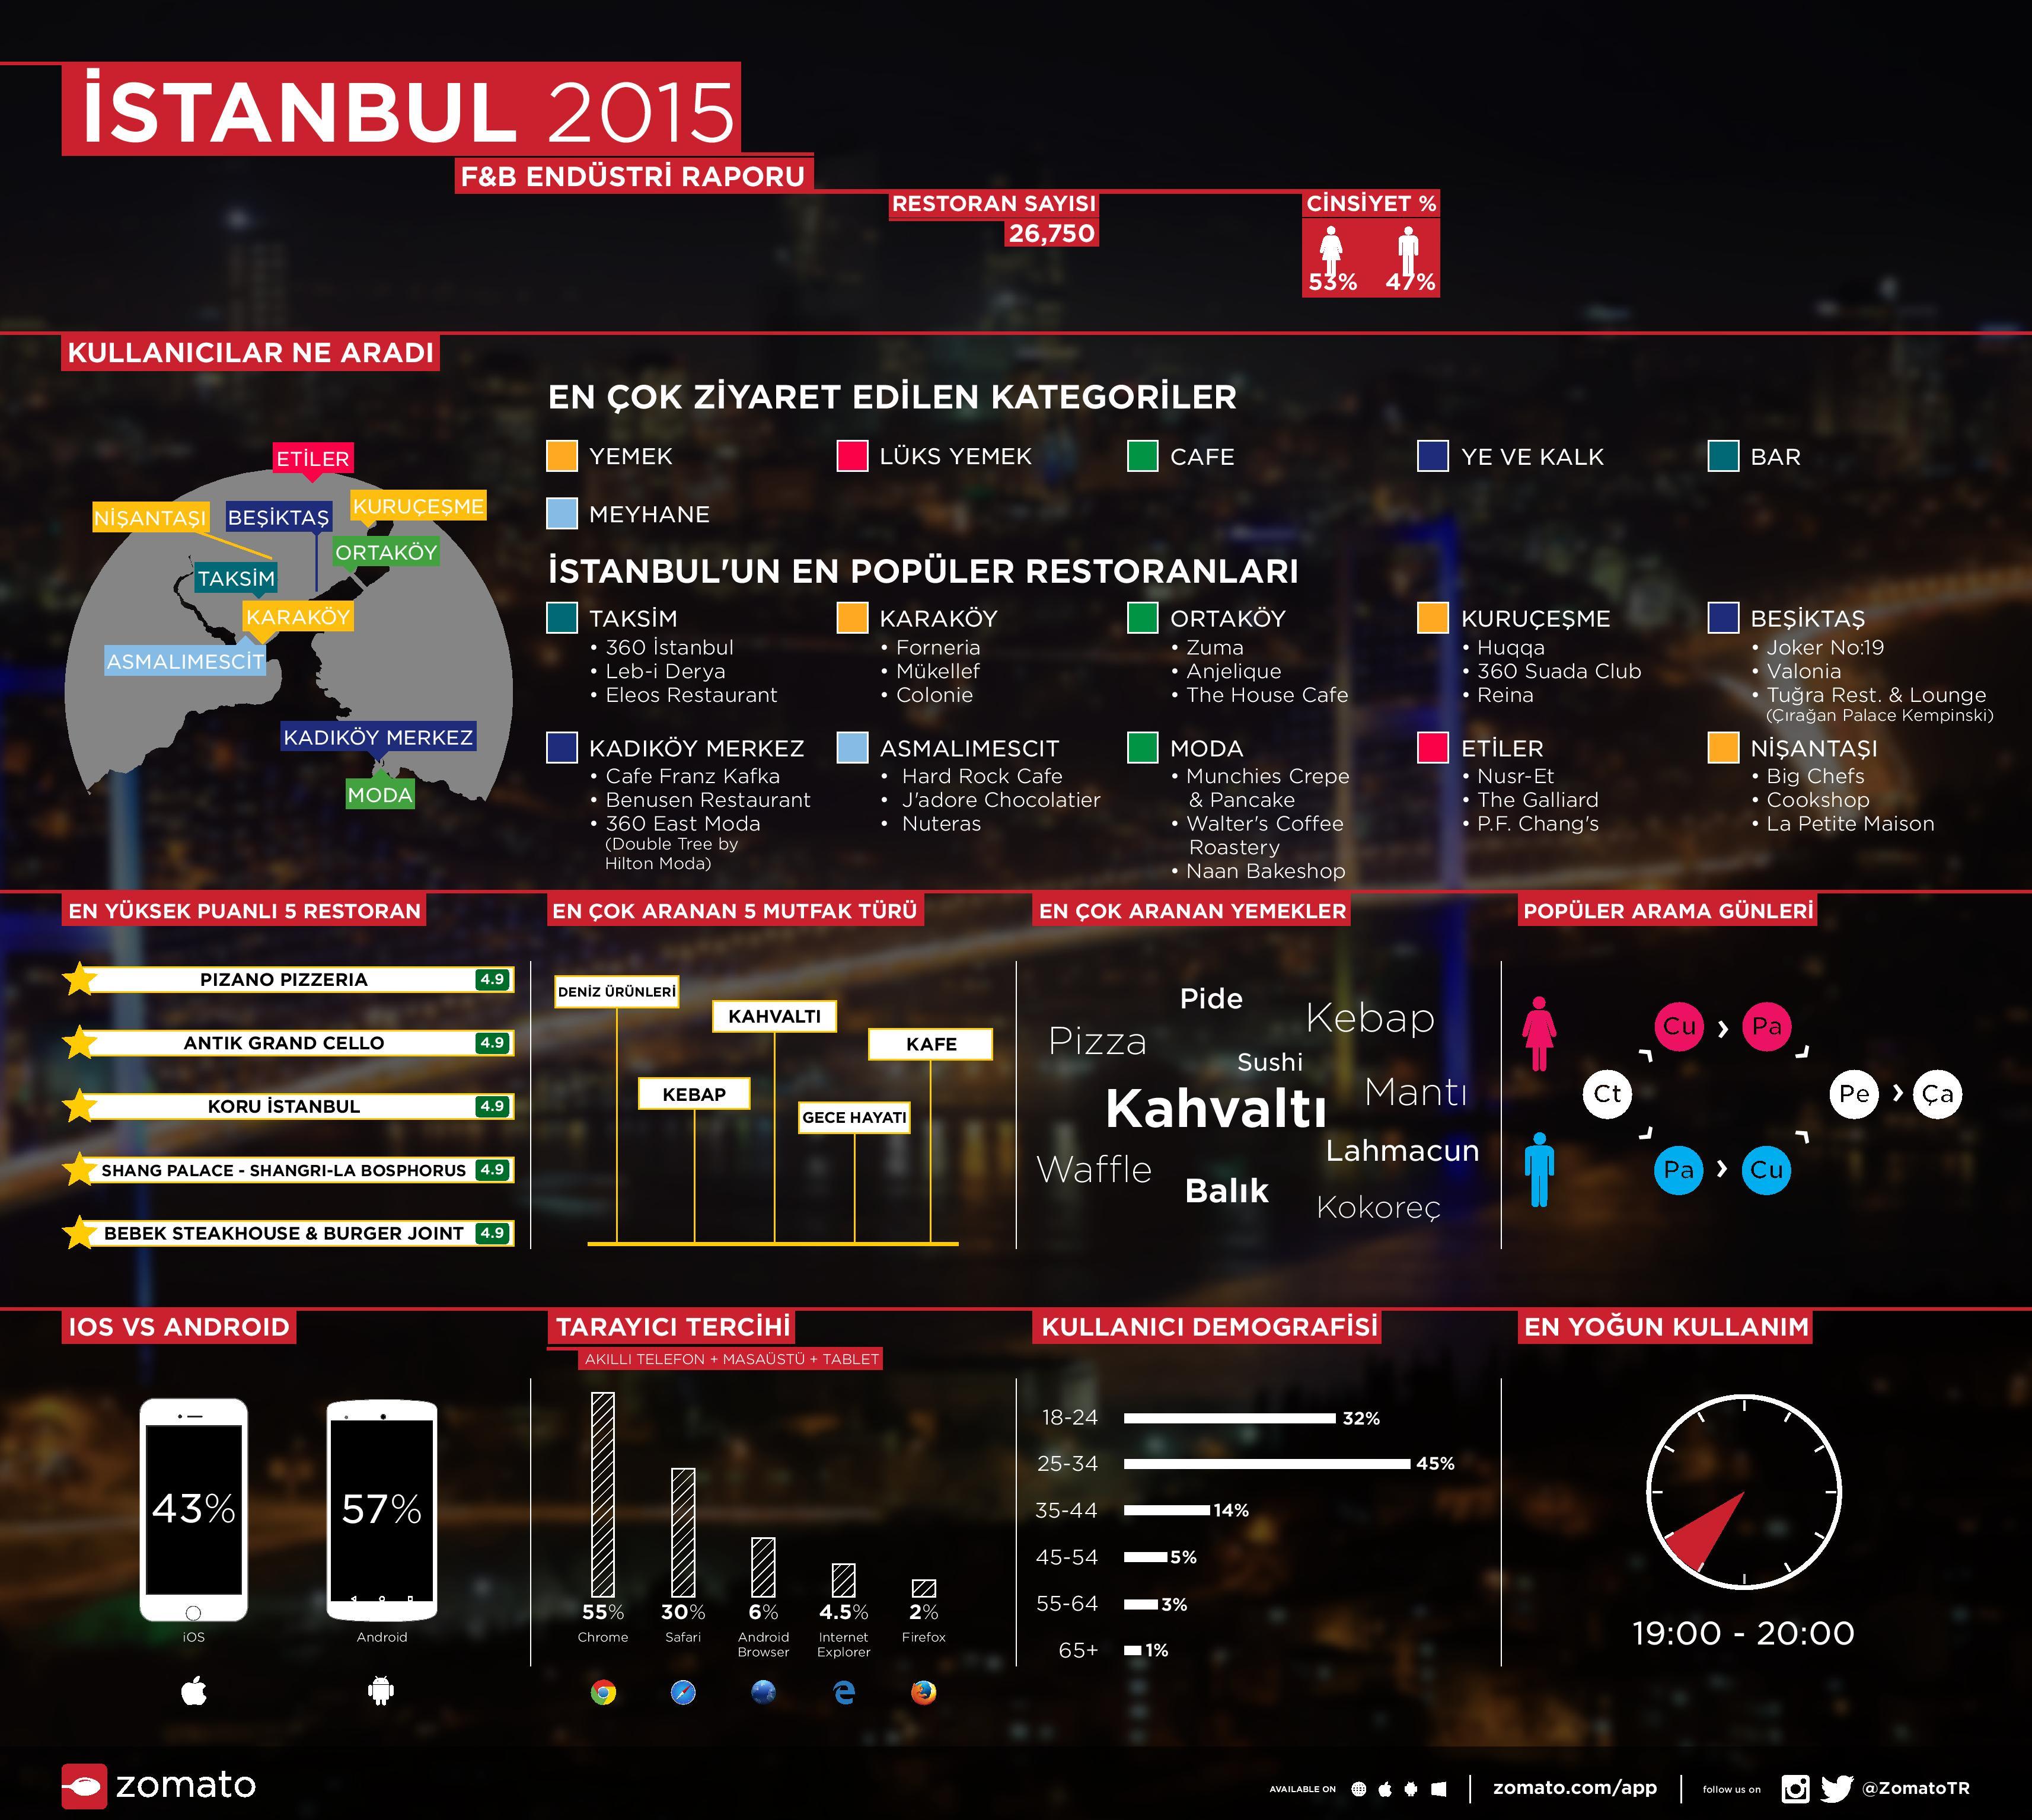 Zomato_2015 Infografik (1)